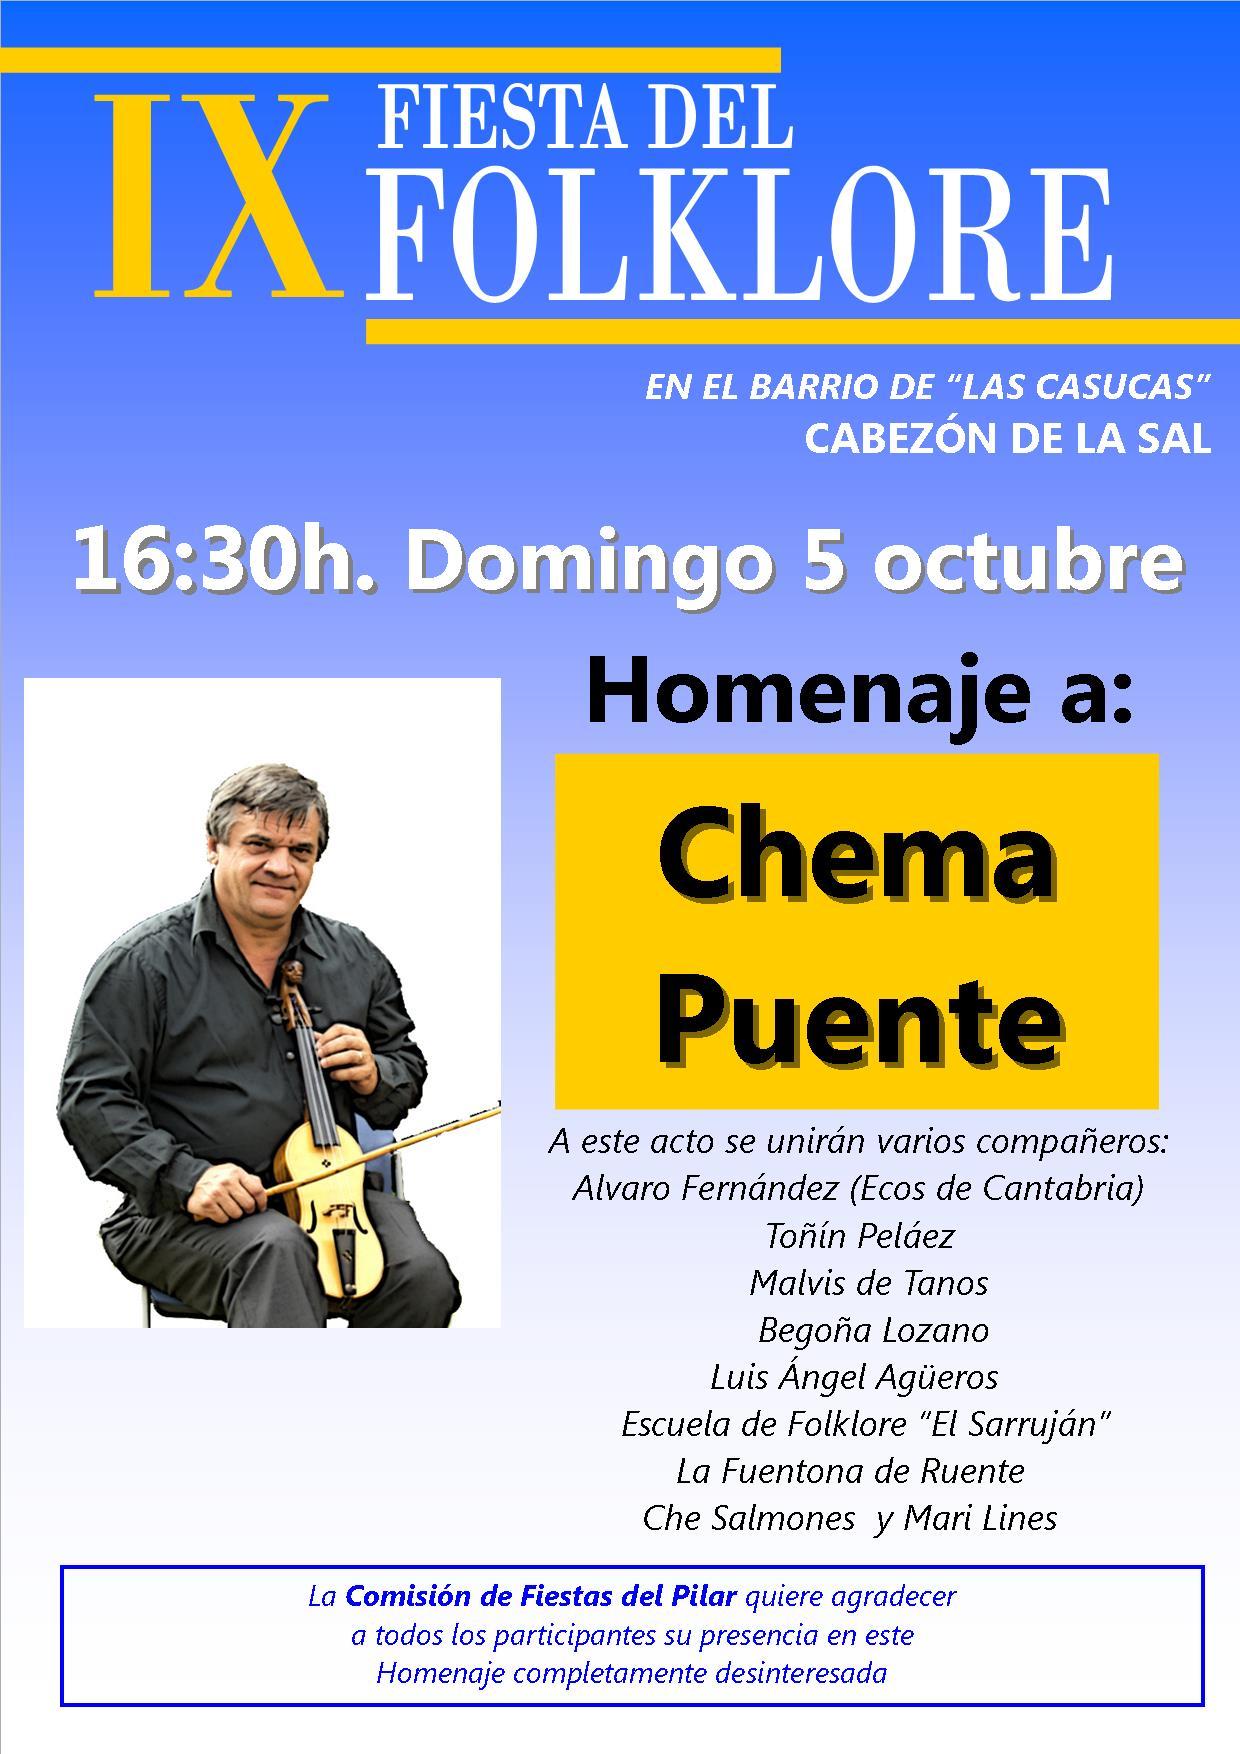 http://www.cabezondelasal.net/wp-content/uploads/2014/09/fiesta-folklore-las-casucas-2014.jpg